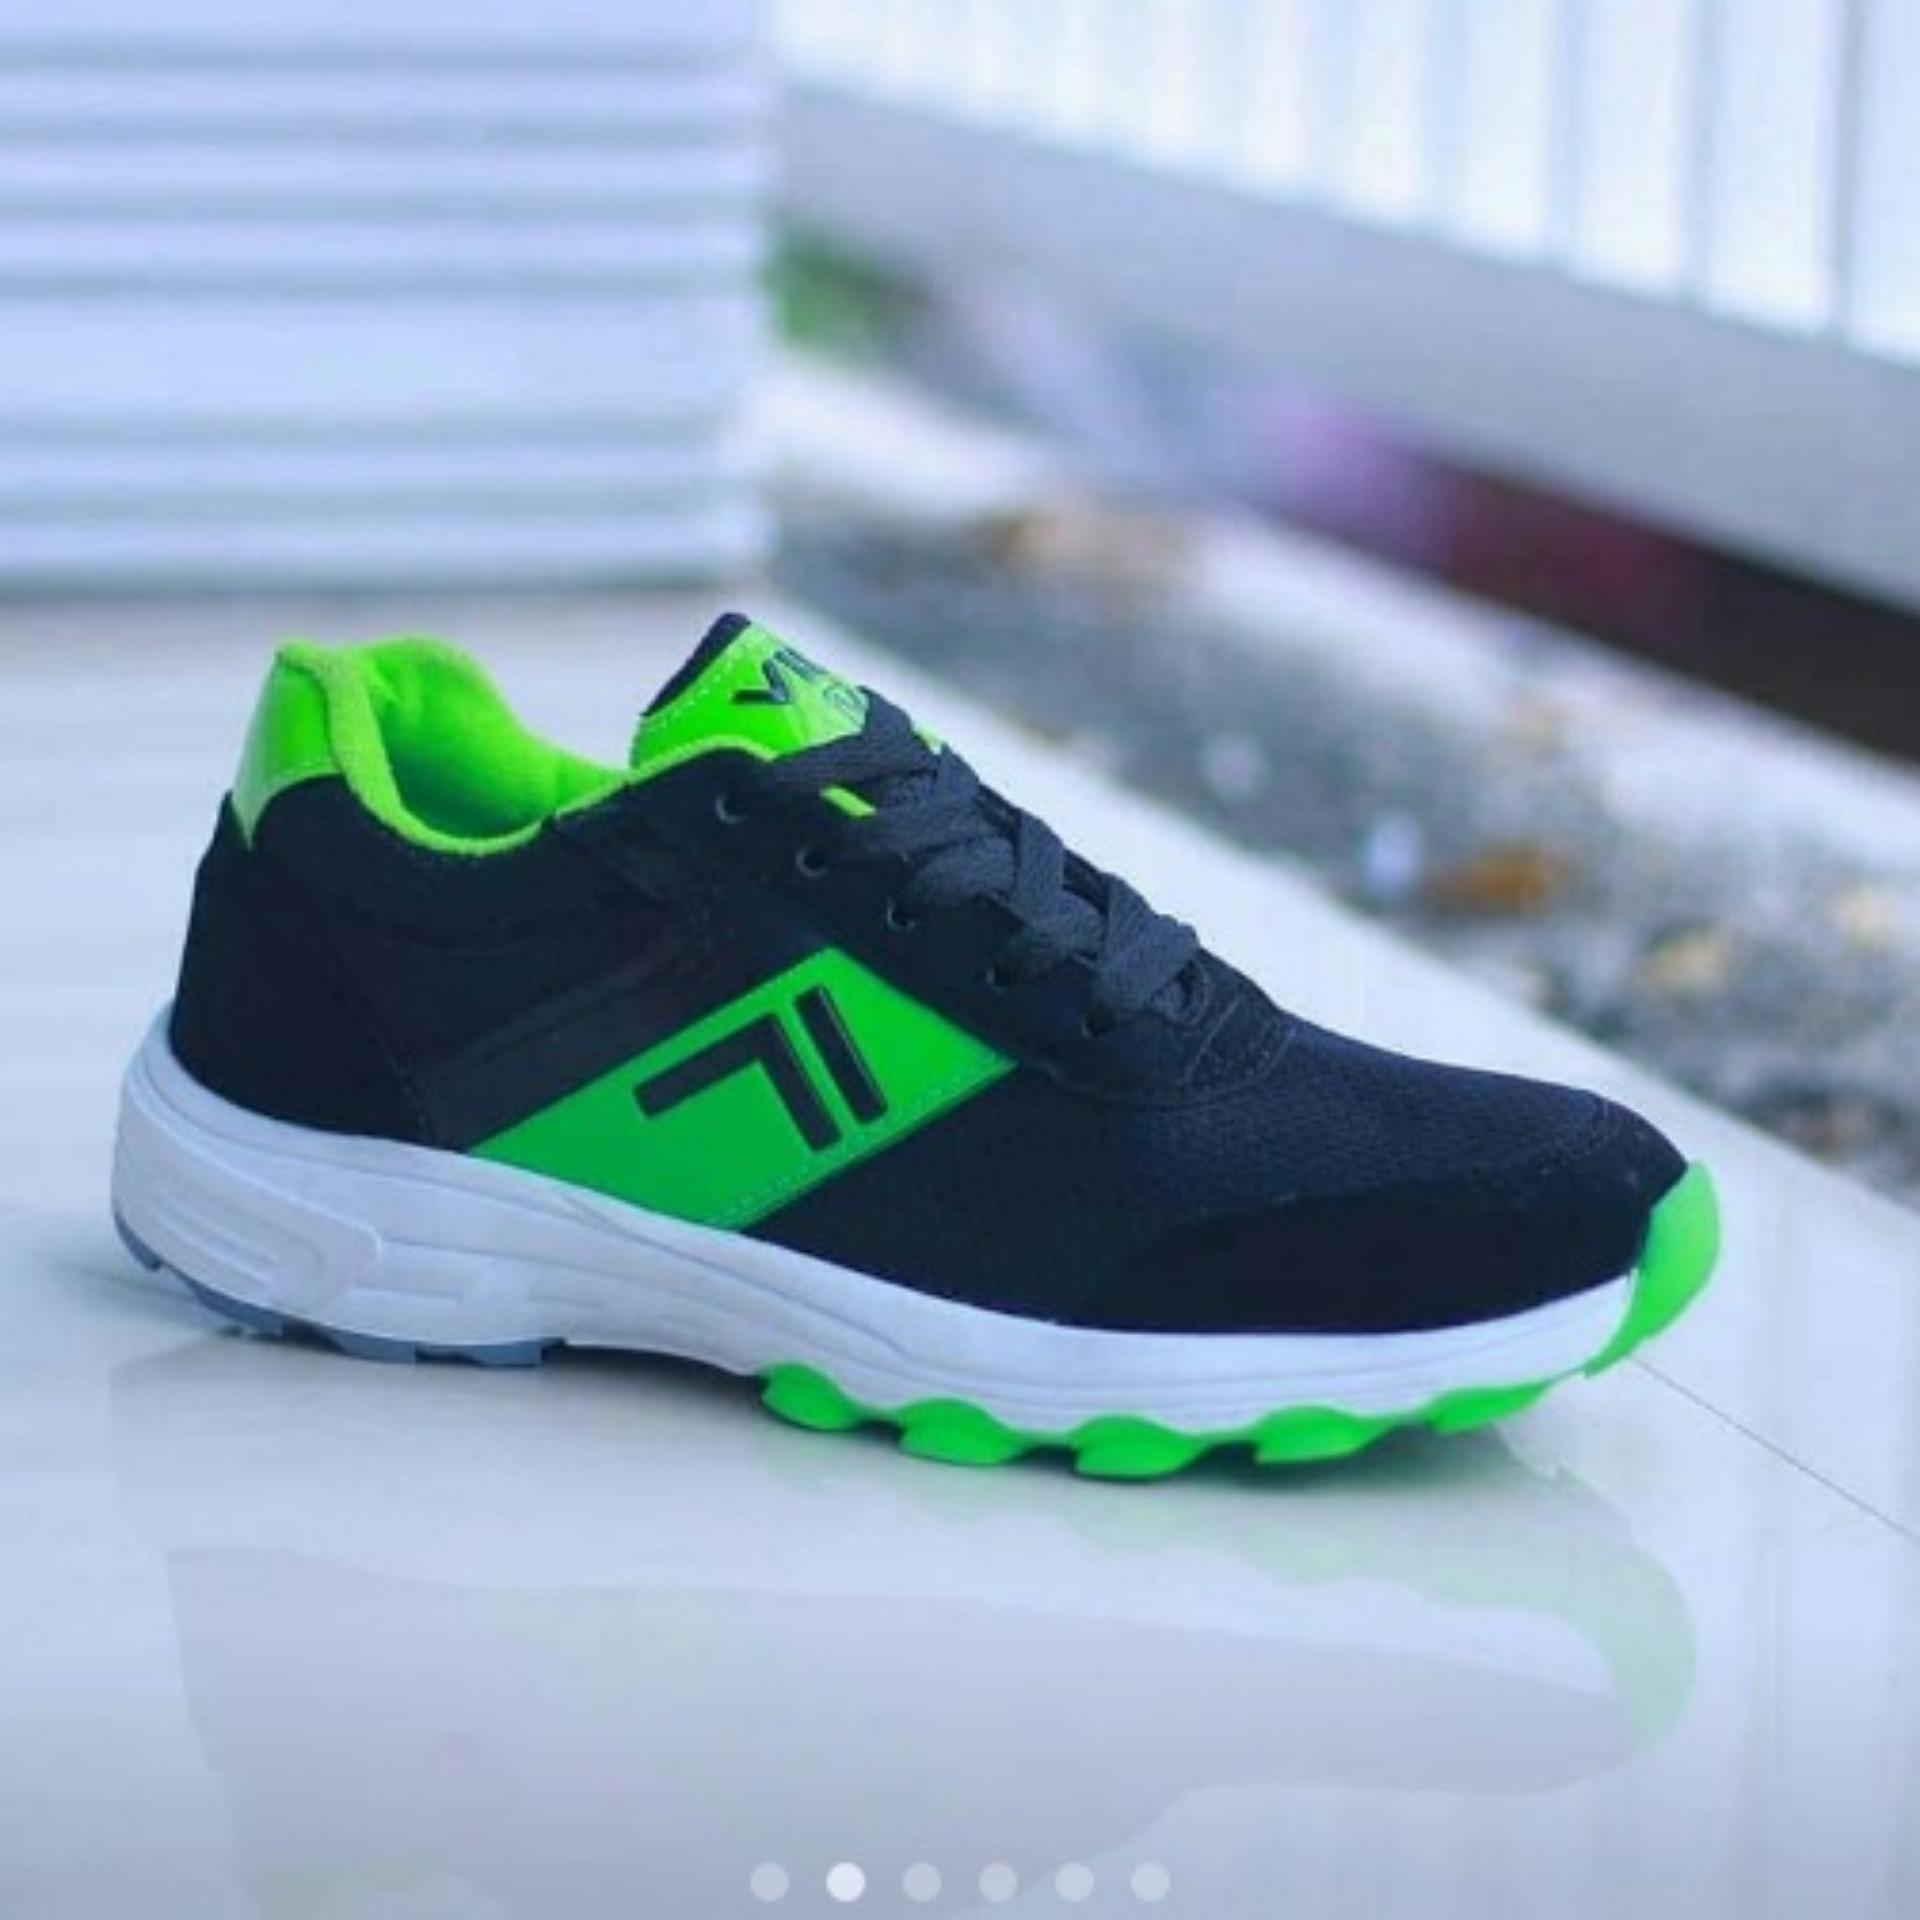 Adinova Shoes Sepatu Sport Pria Villanova Sepatu Sneaker Pria Villanova    Sepatu Olahraga Sepatu 72f2017a5c